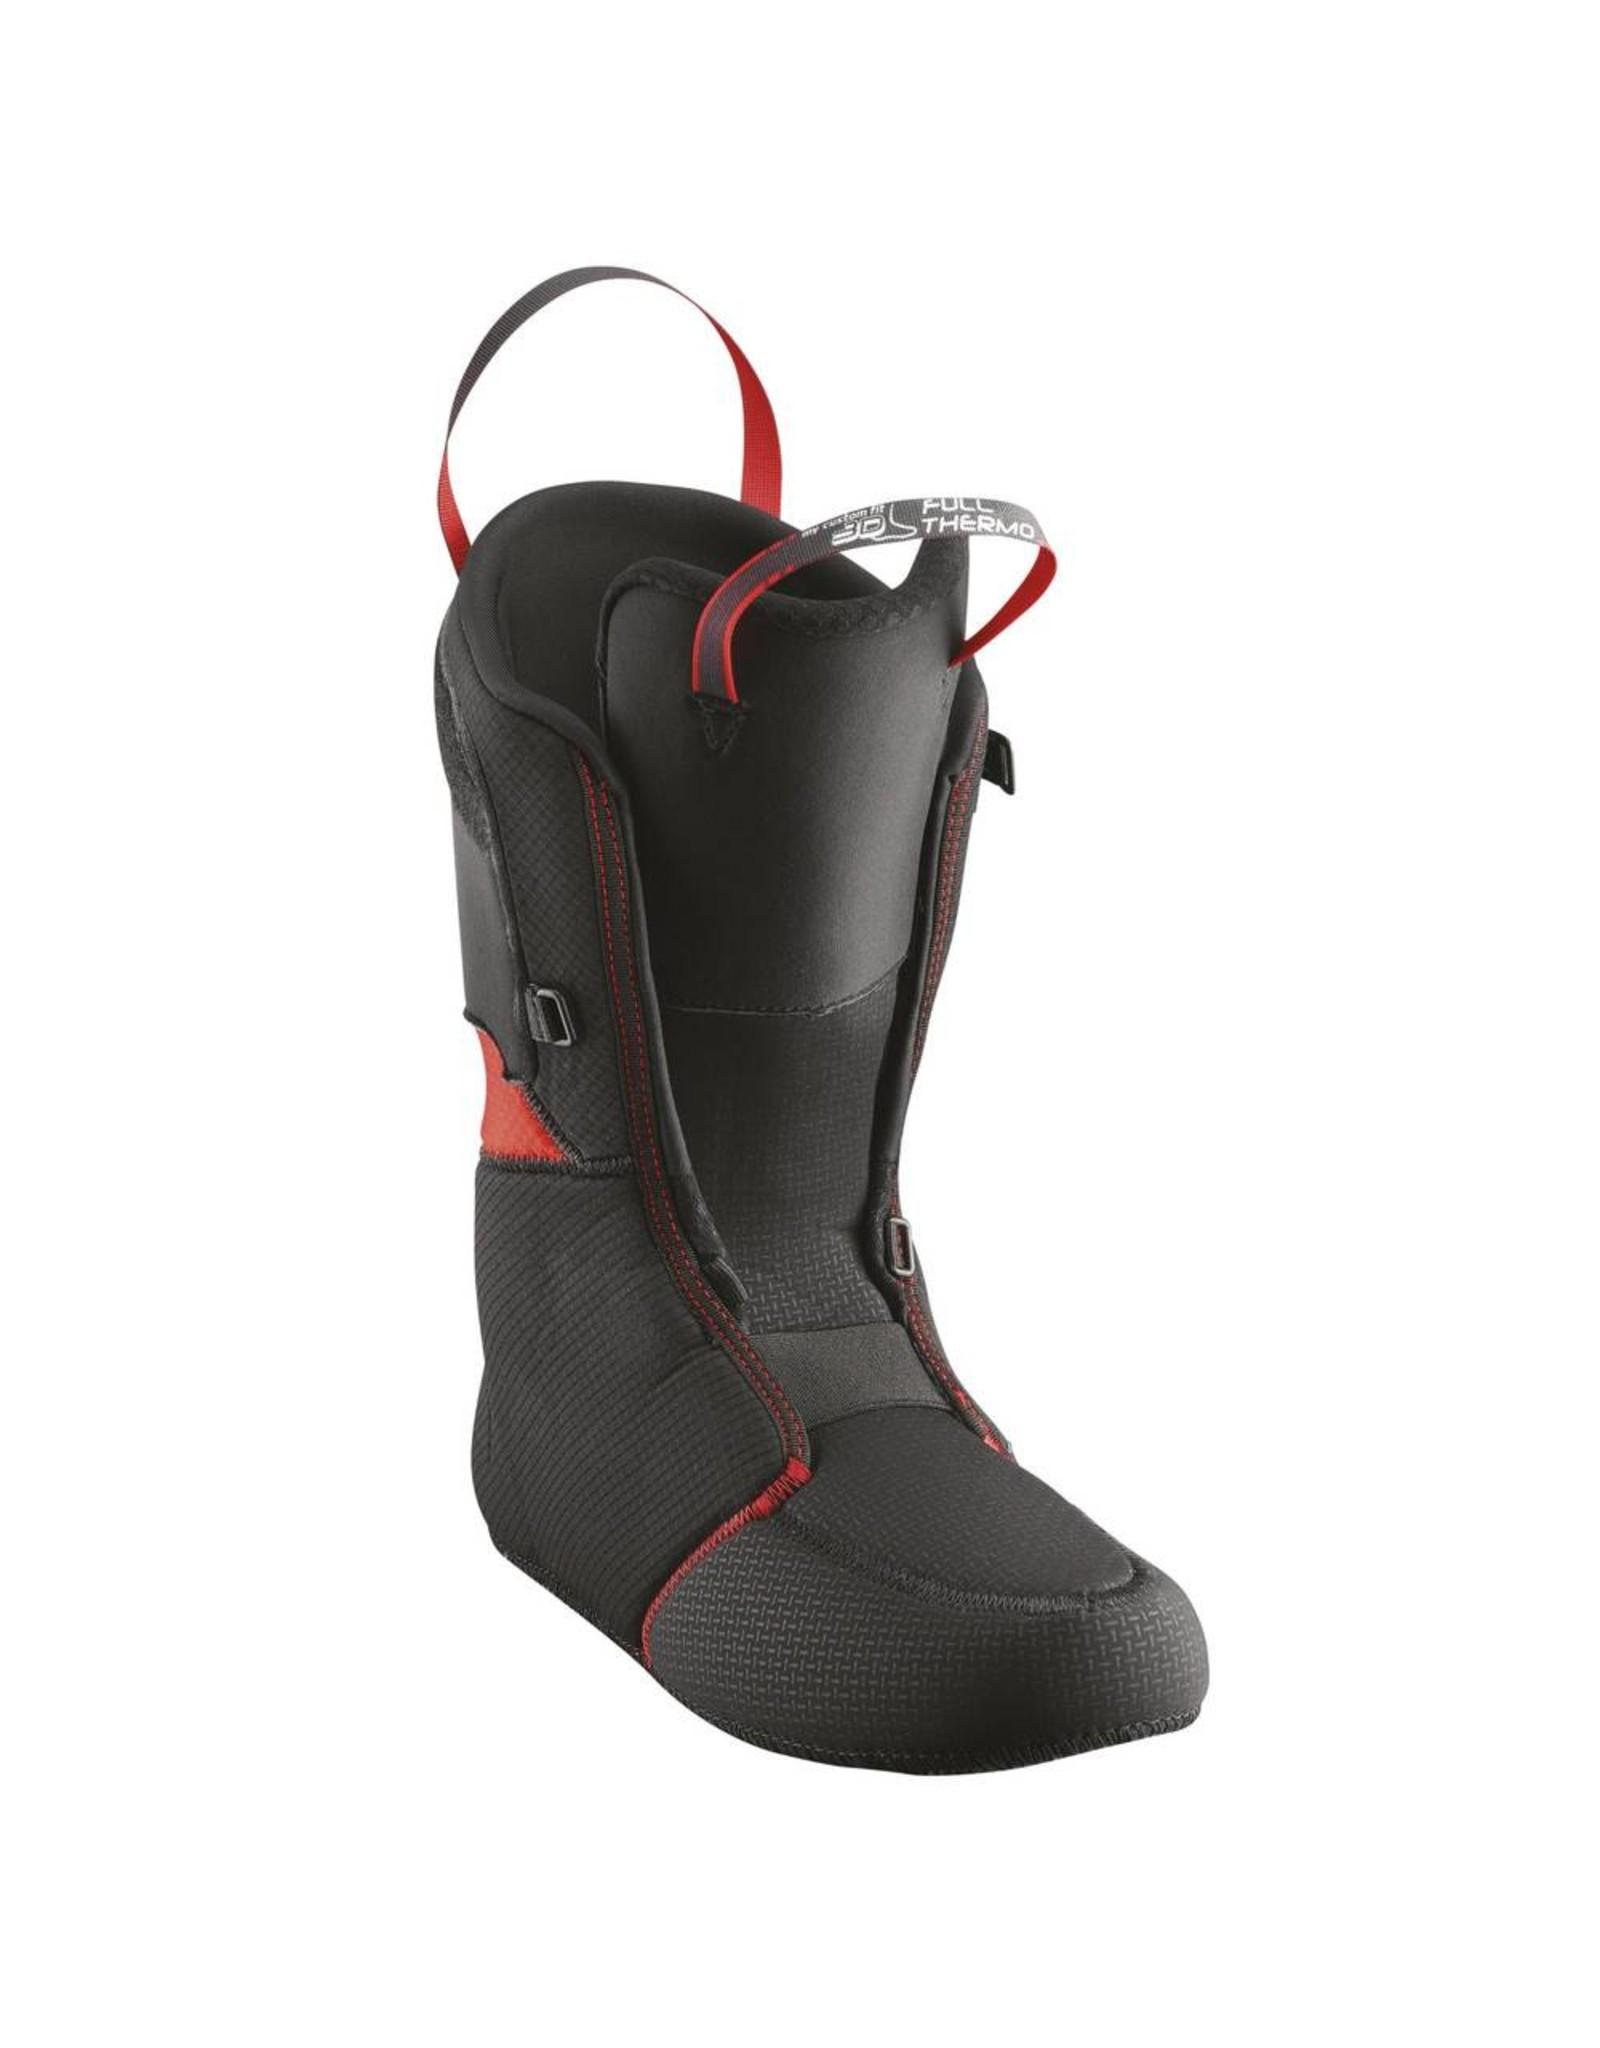 Salomon Salomon S/Lab X-Alp Ski Boots